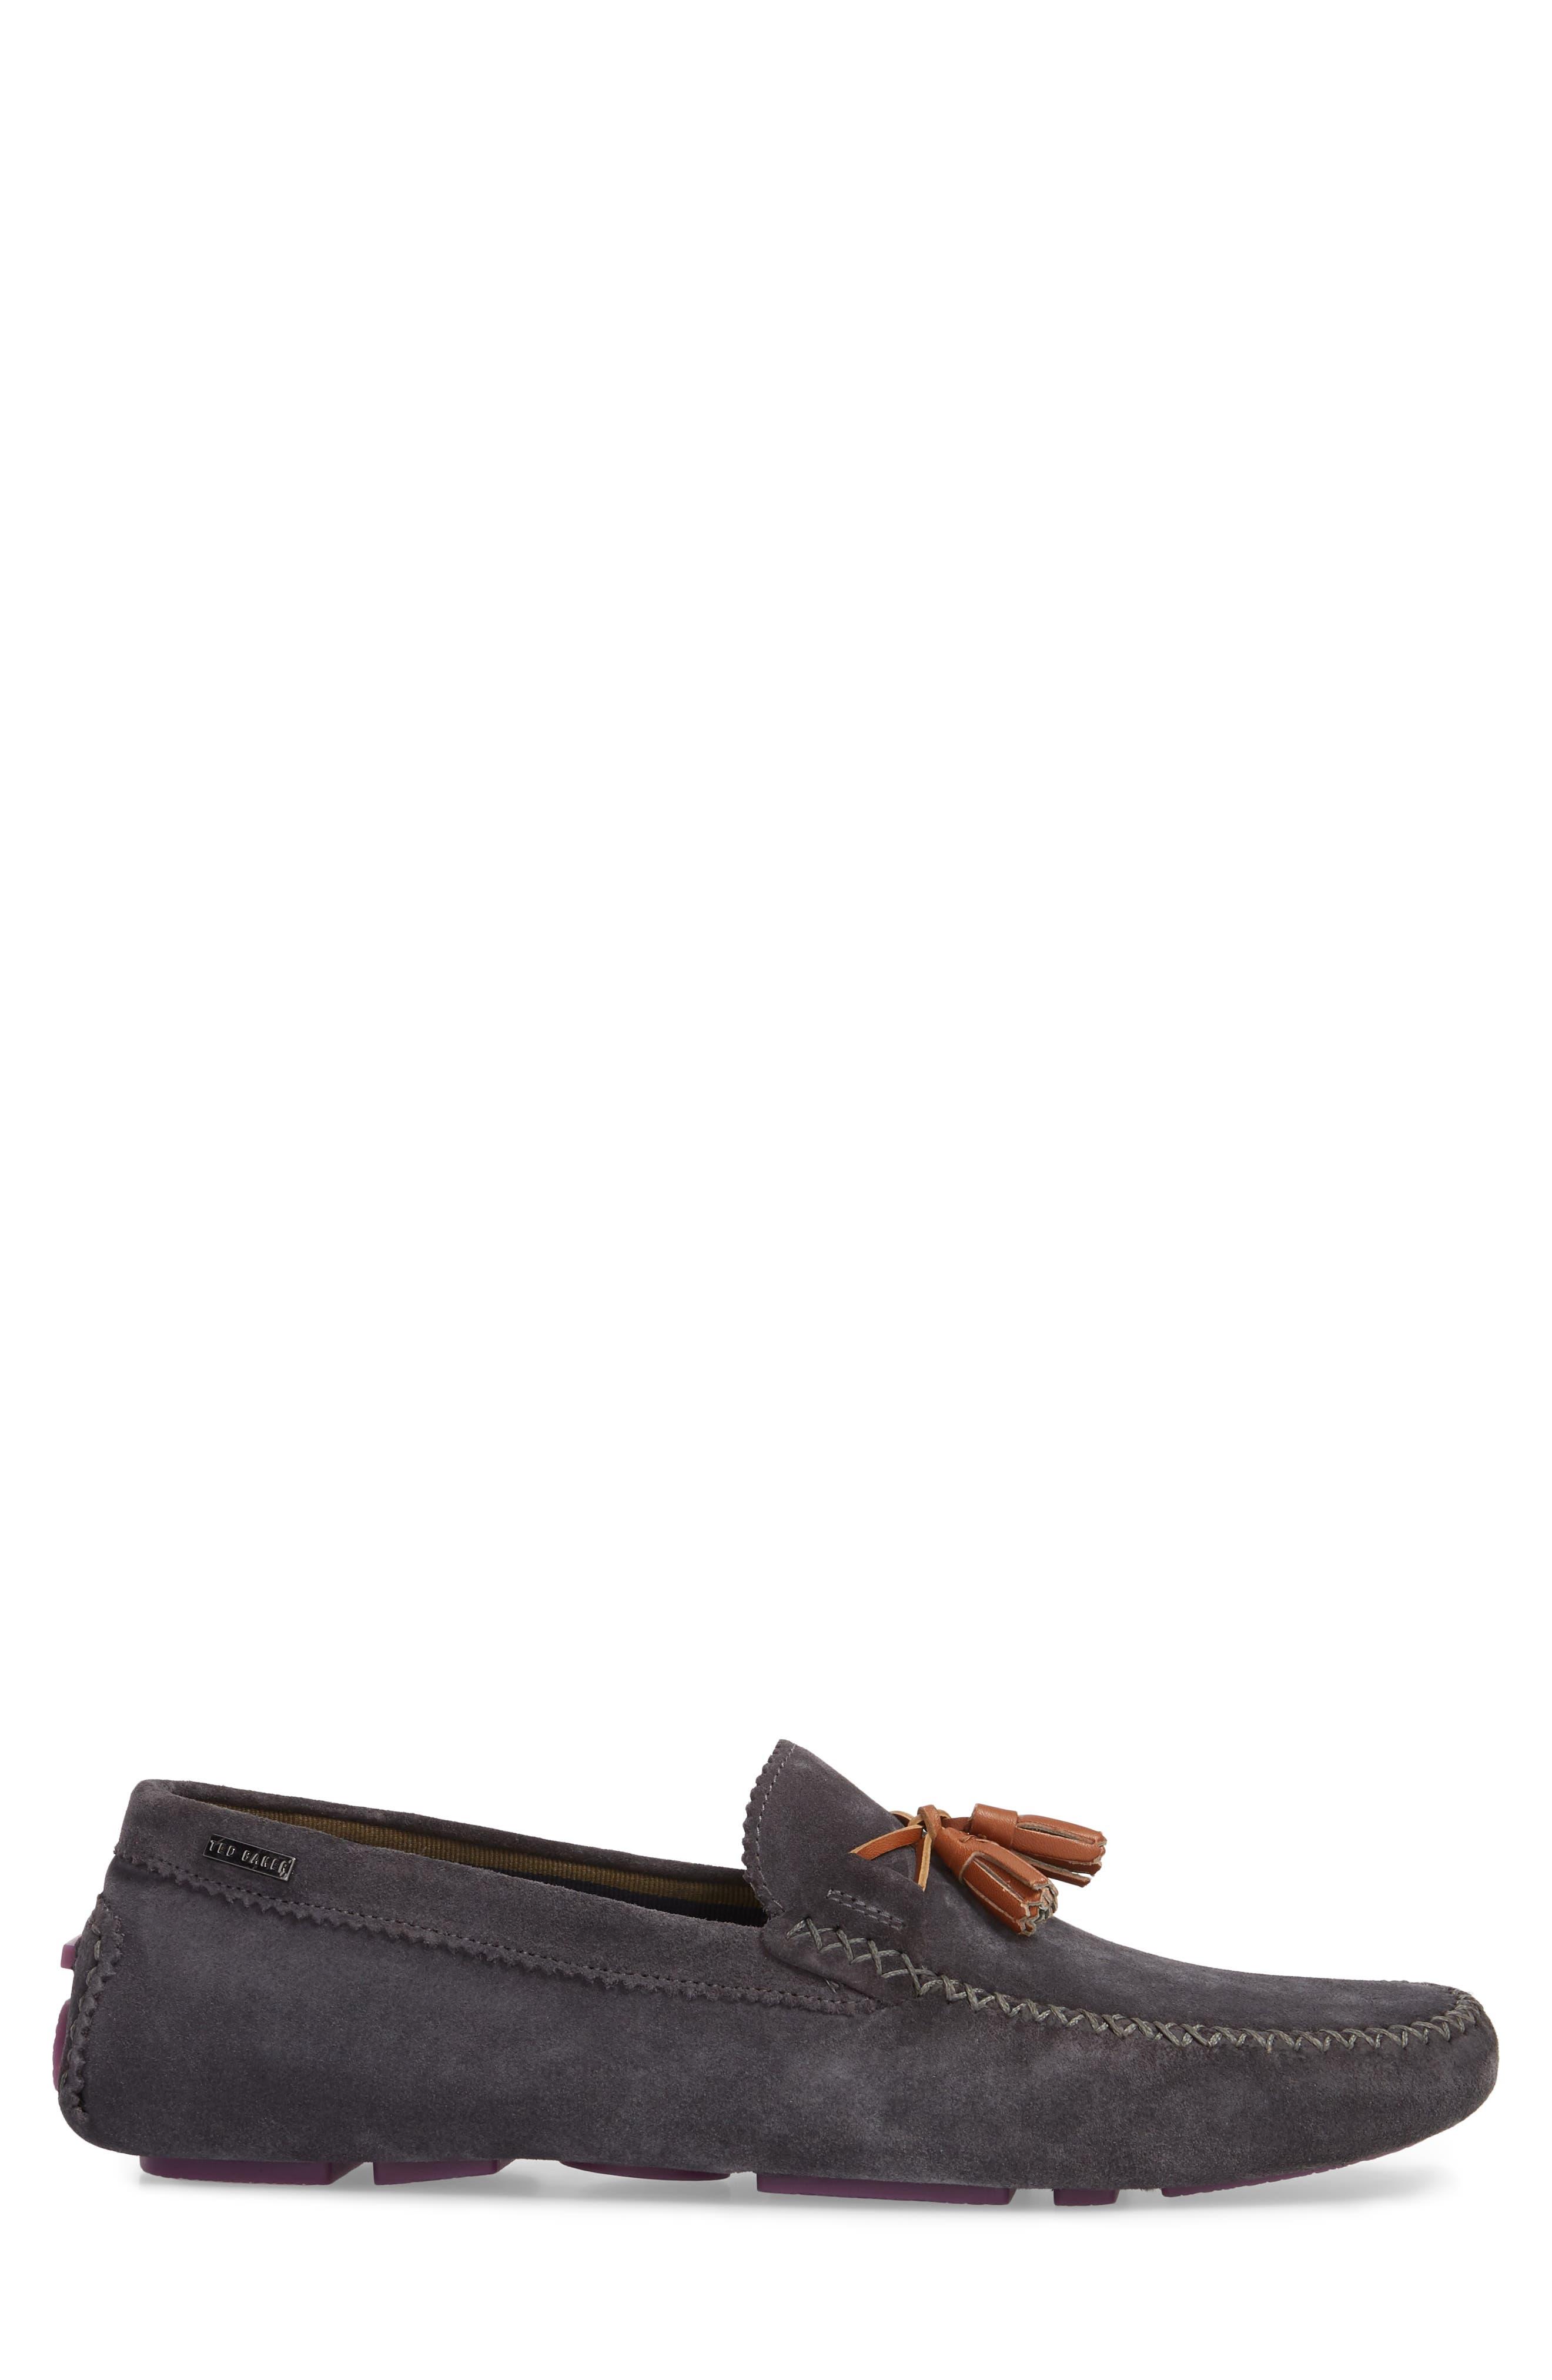 Urbonns Tasseled Driving Loafer,                             Alternate thumbnail 3, color,                             070